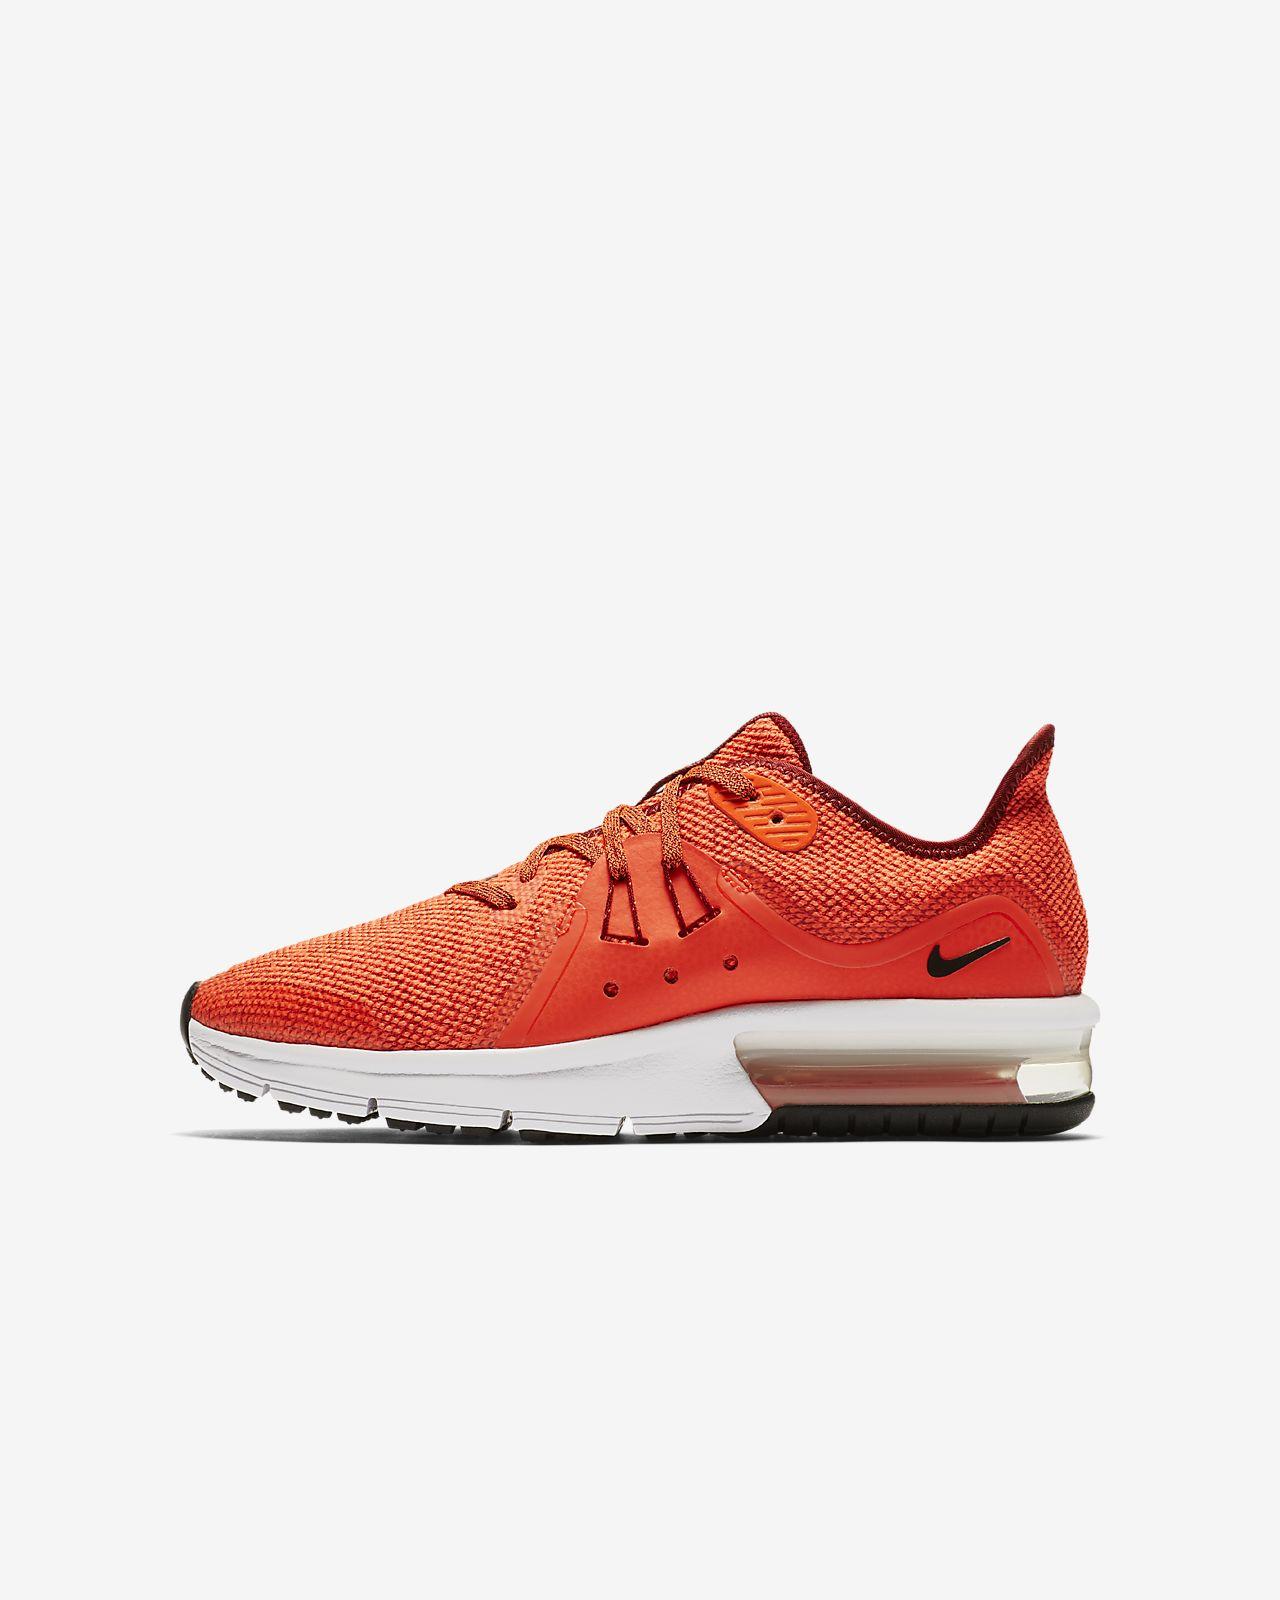 Nike Air Max Sequent 3 Kinderschoen